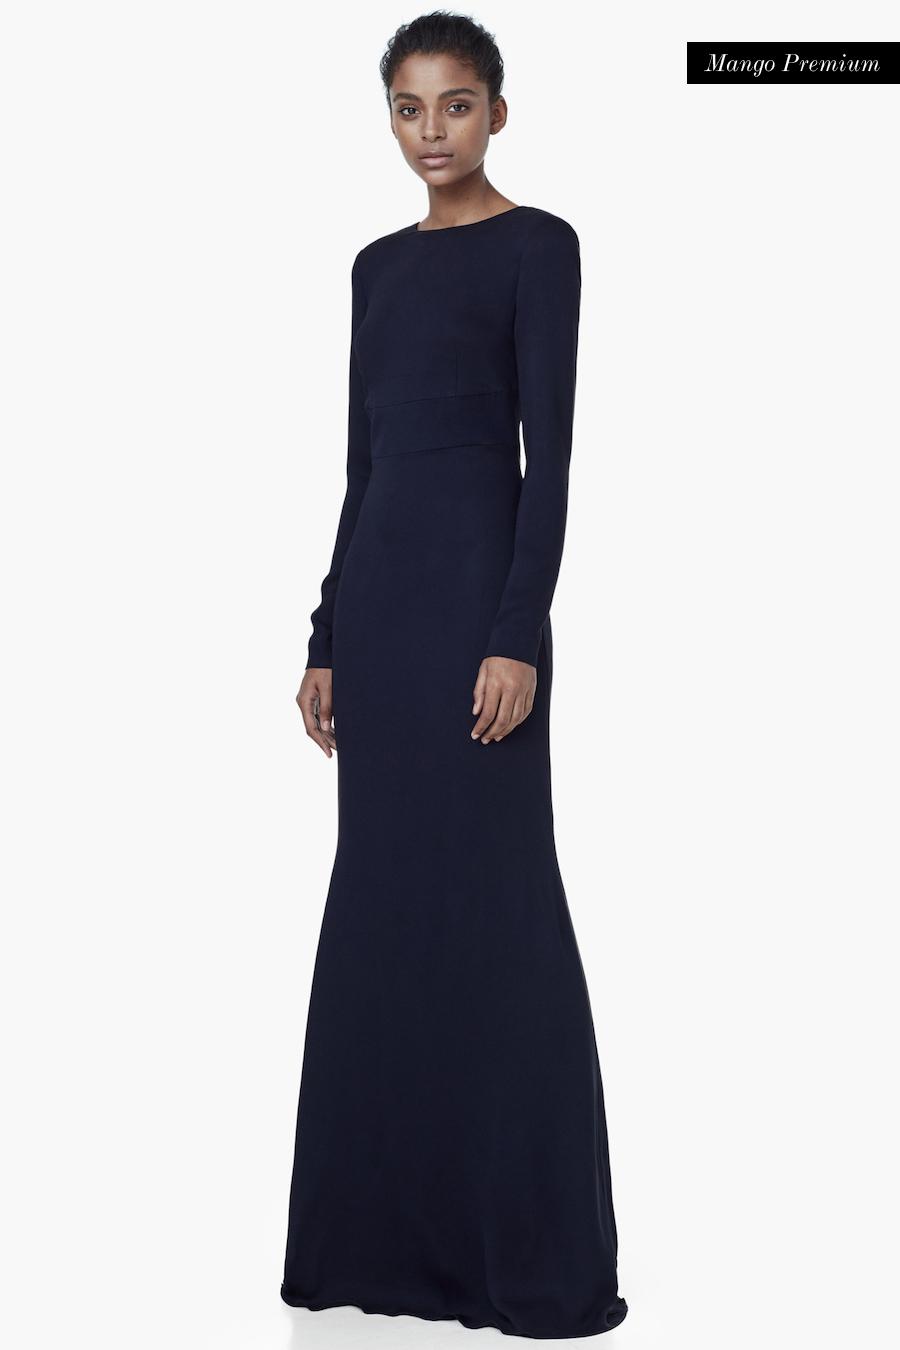 Maxi dress under 200 fash-n-chips.com 2